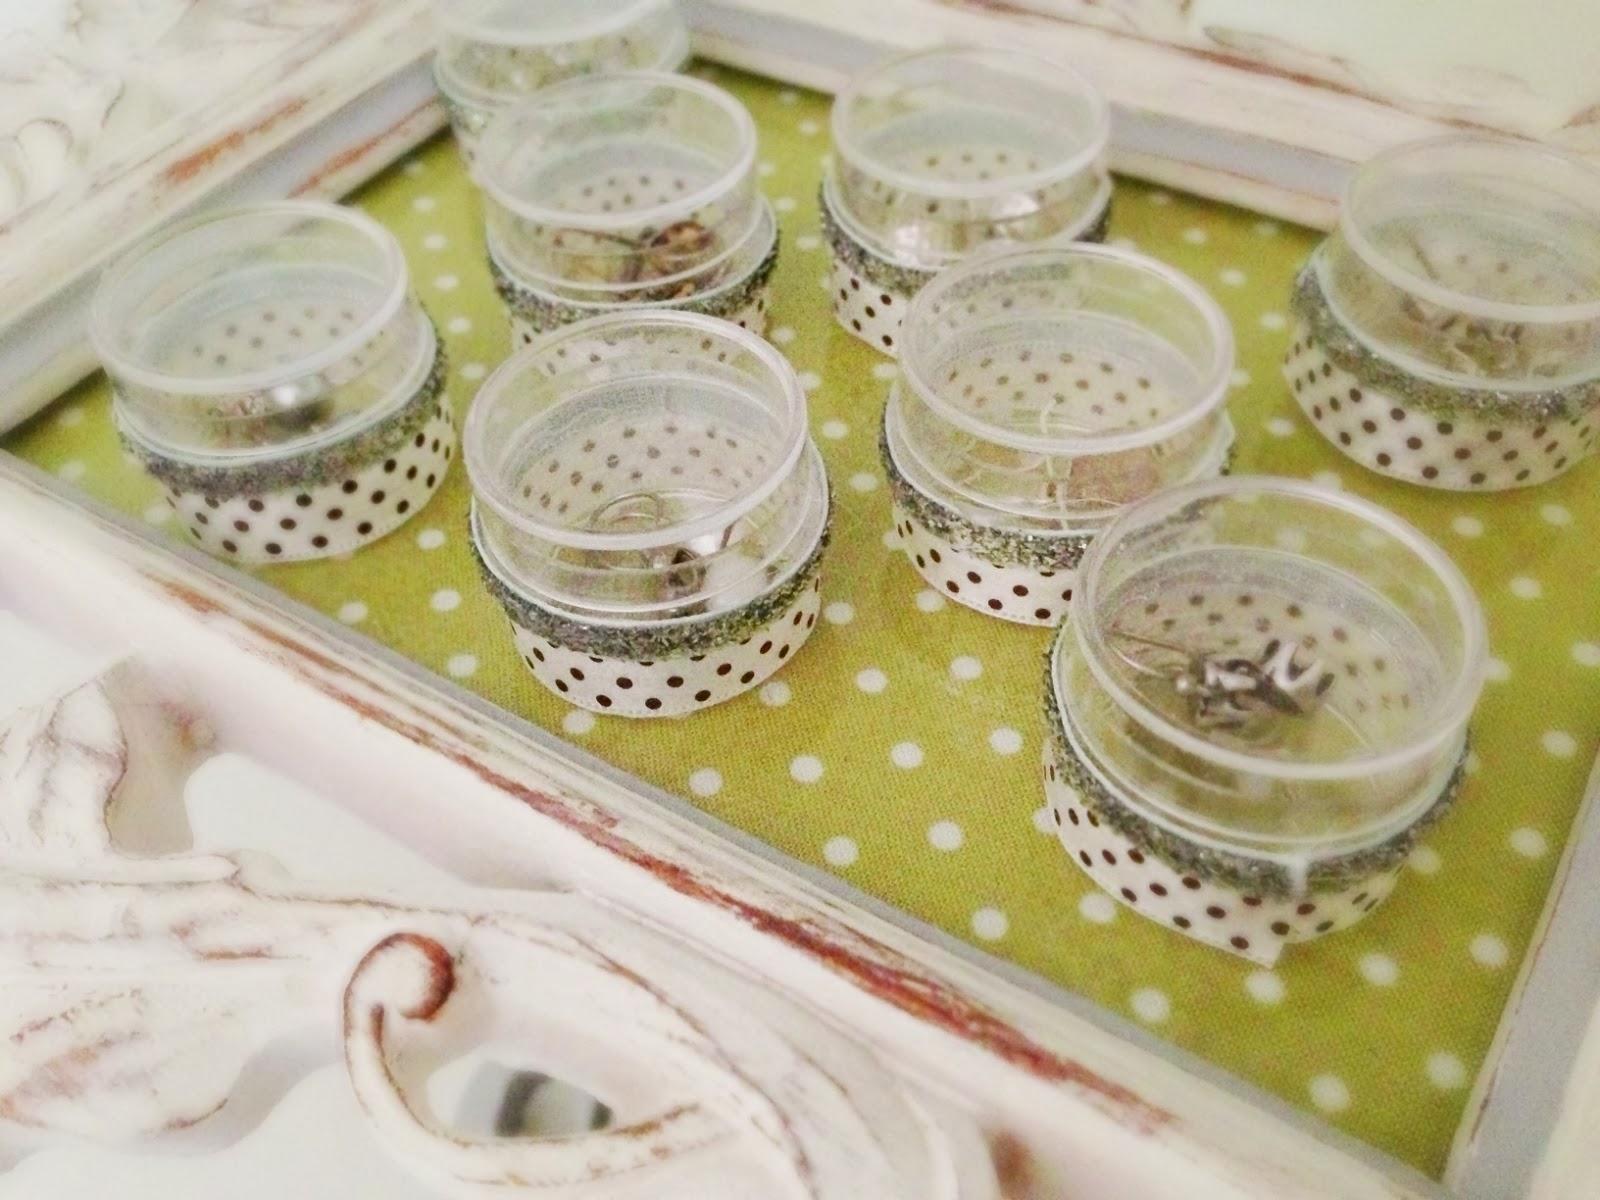 Recycled Christmas Decor Using Plastic Bottles Jewelry Holder Hy Nester